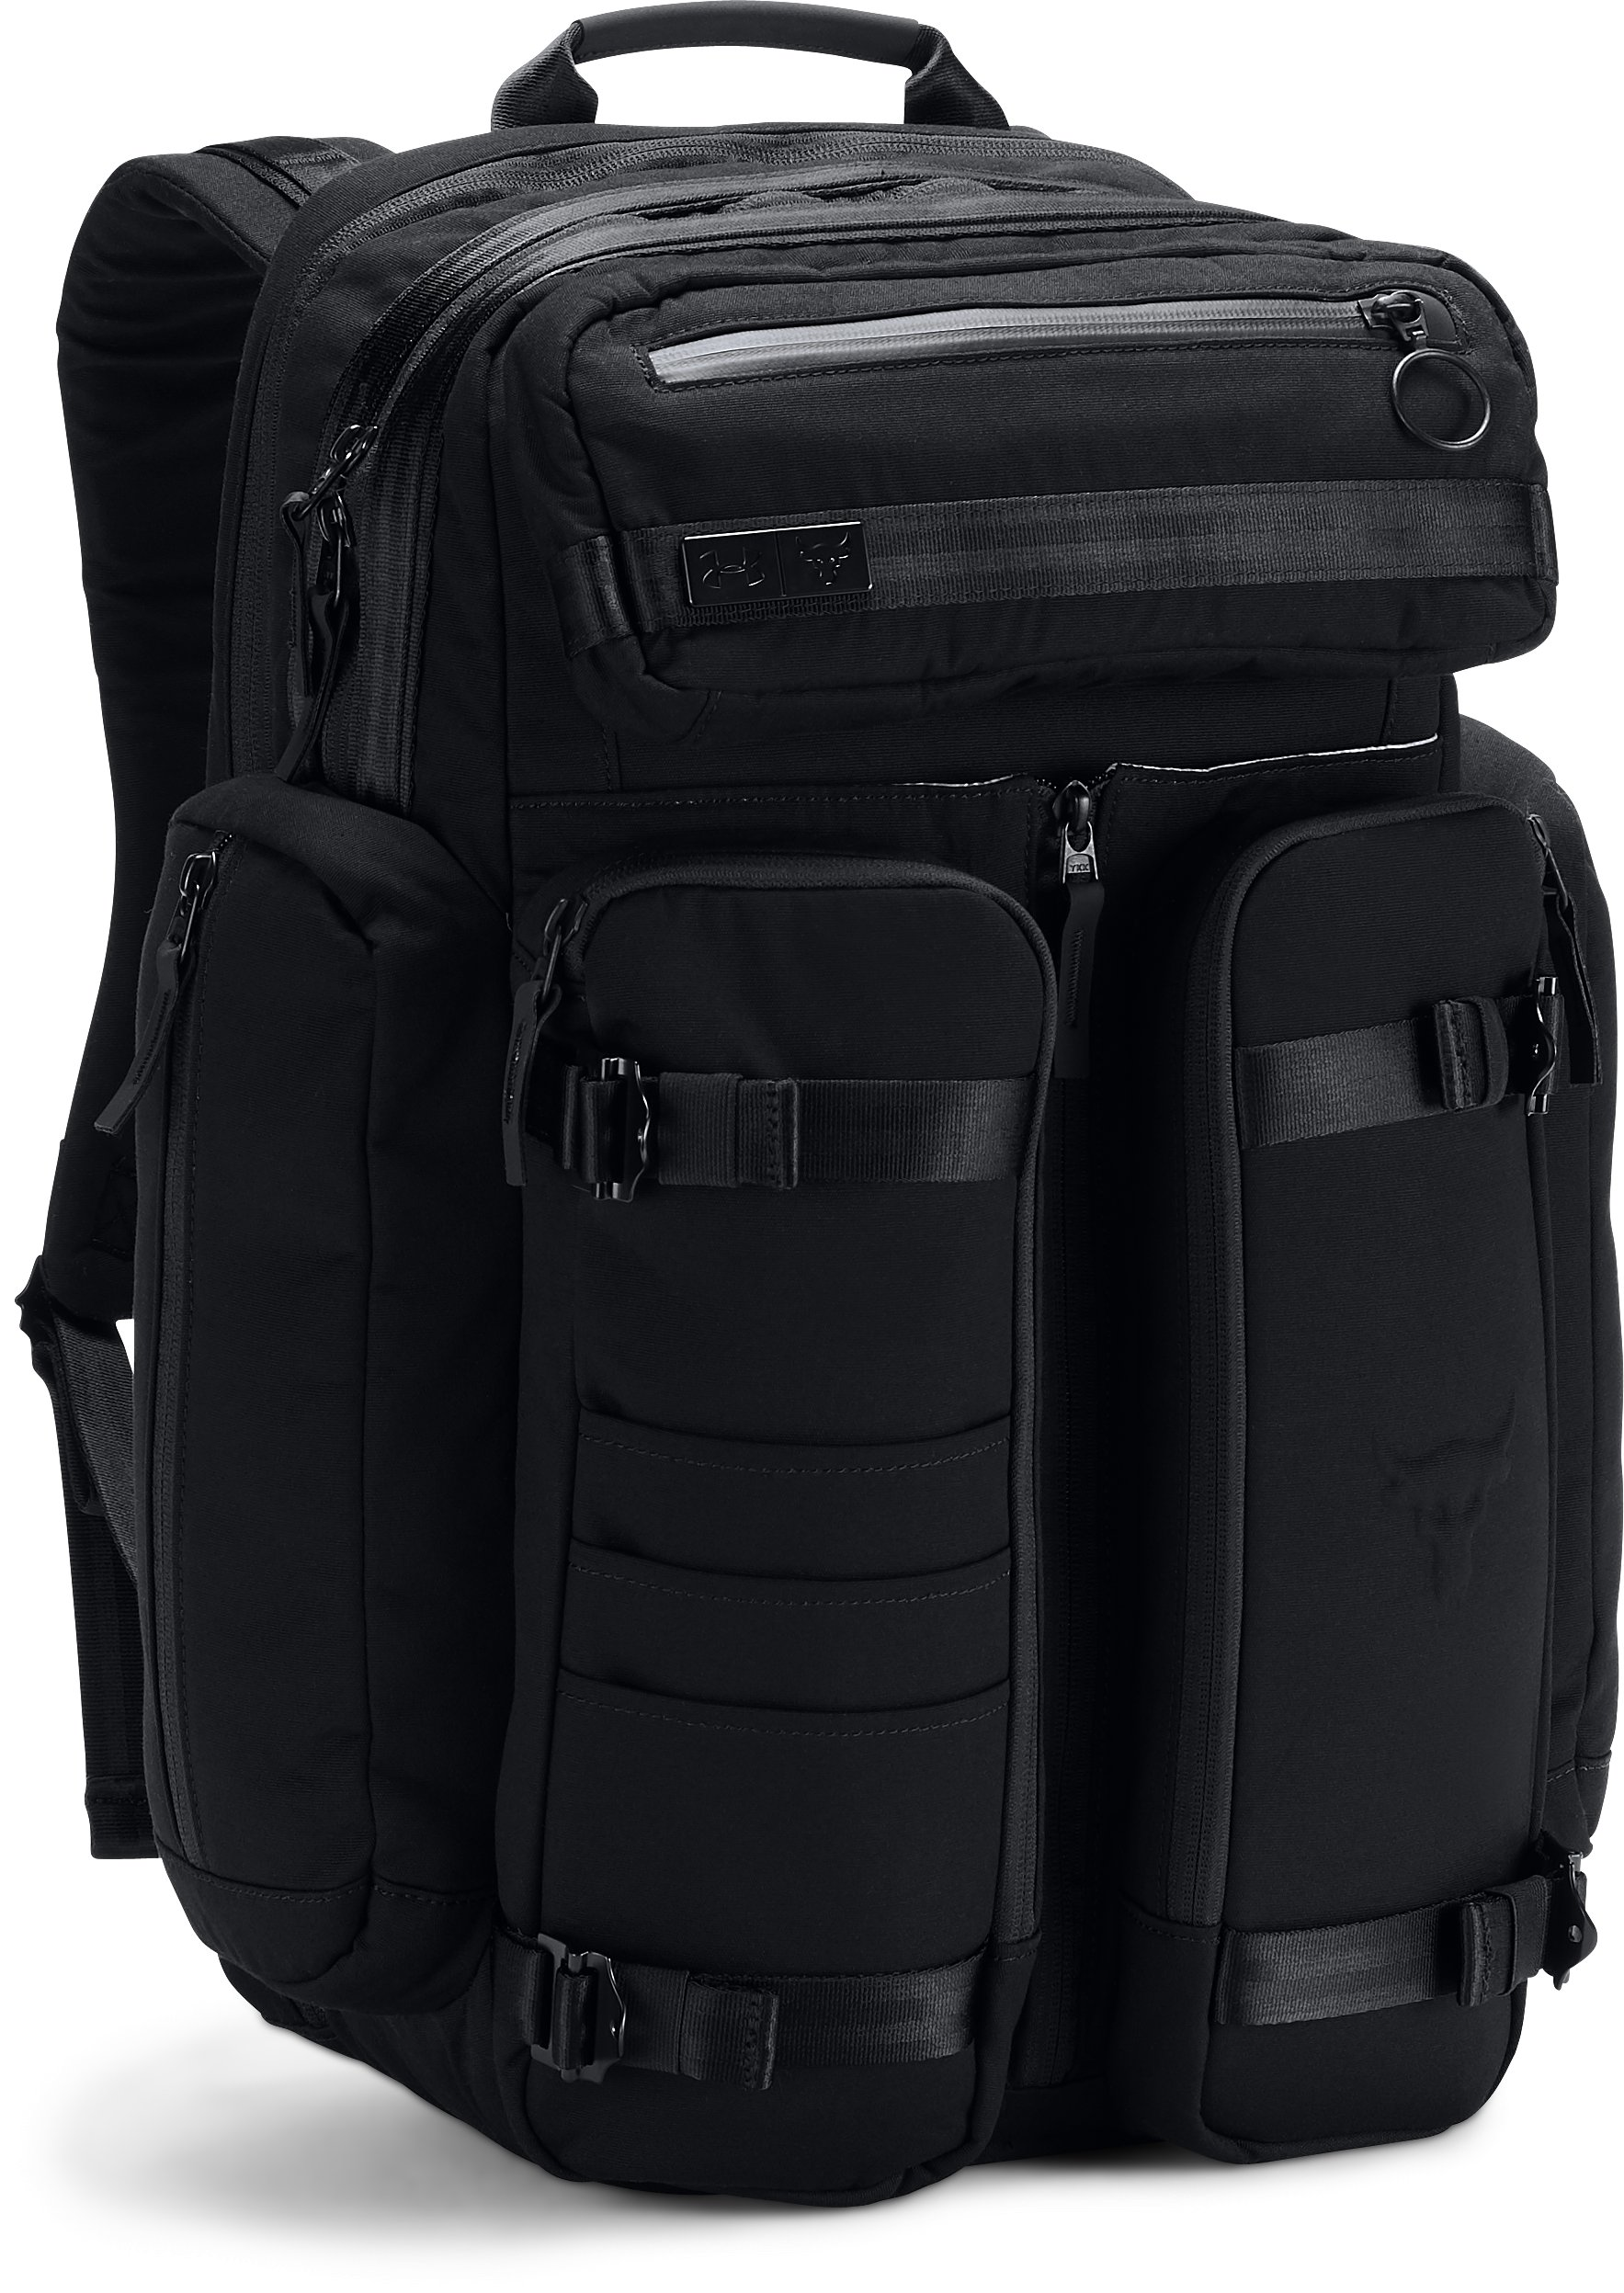 UA Pro Series Rock Backpack